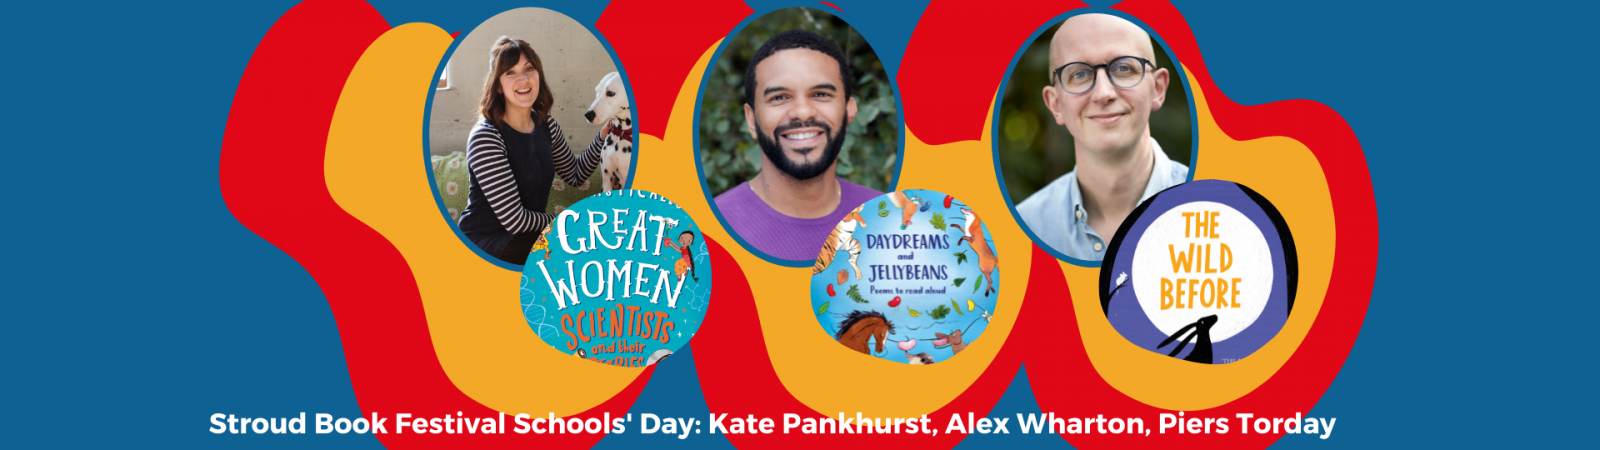 VIRTUAL TICKET: Book Festival Schools' Day